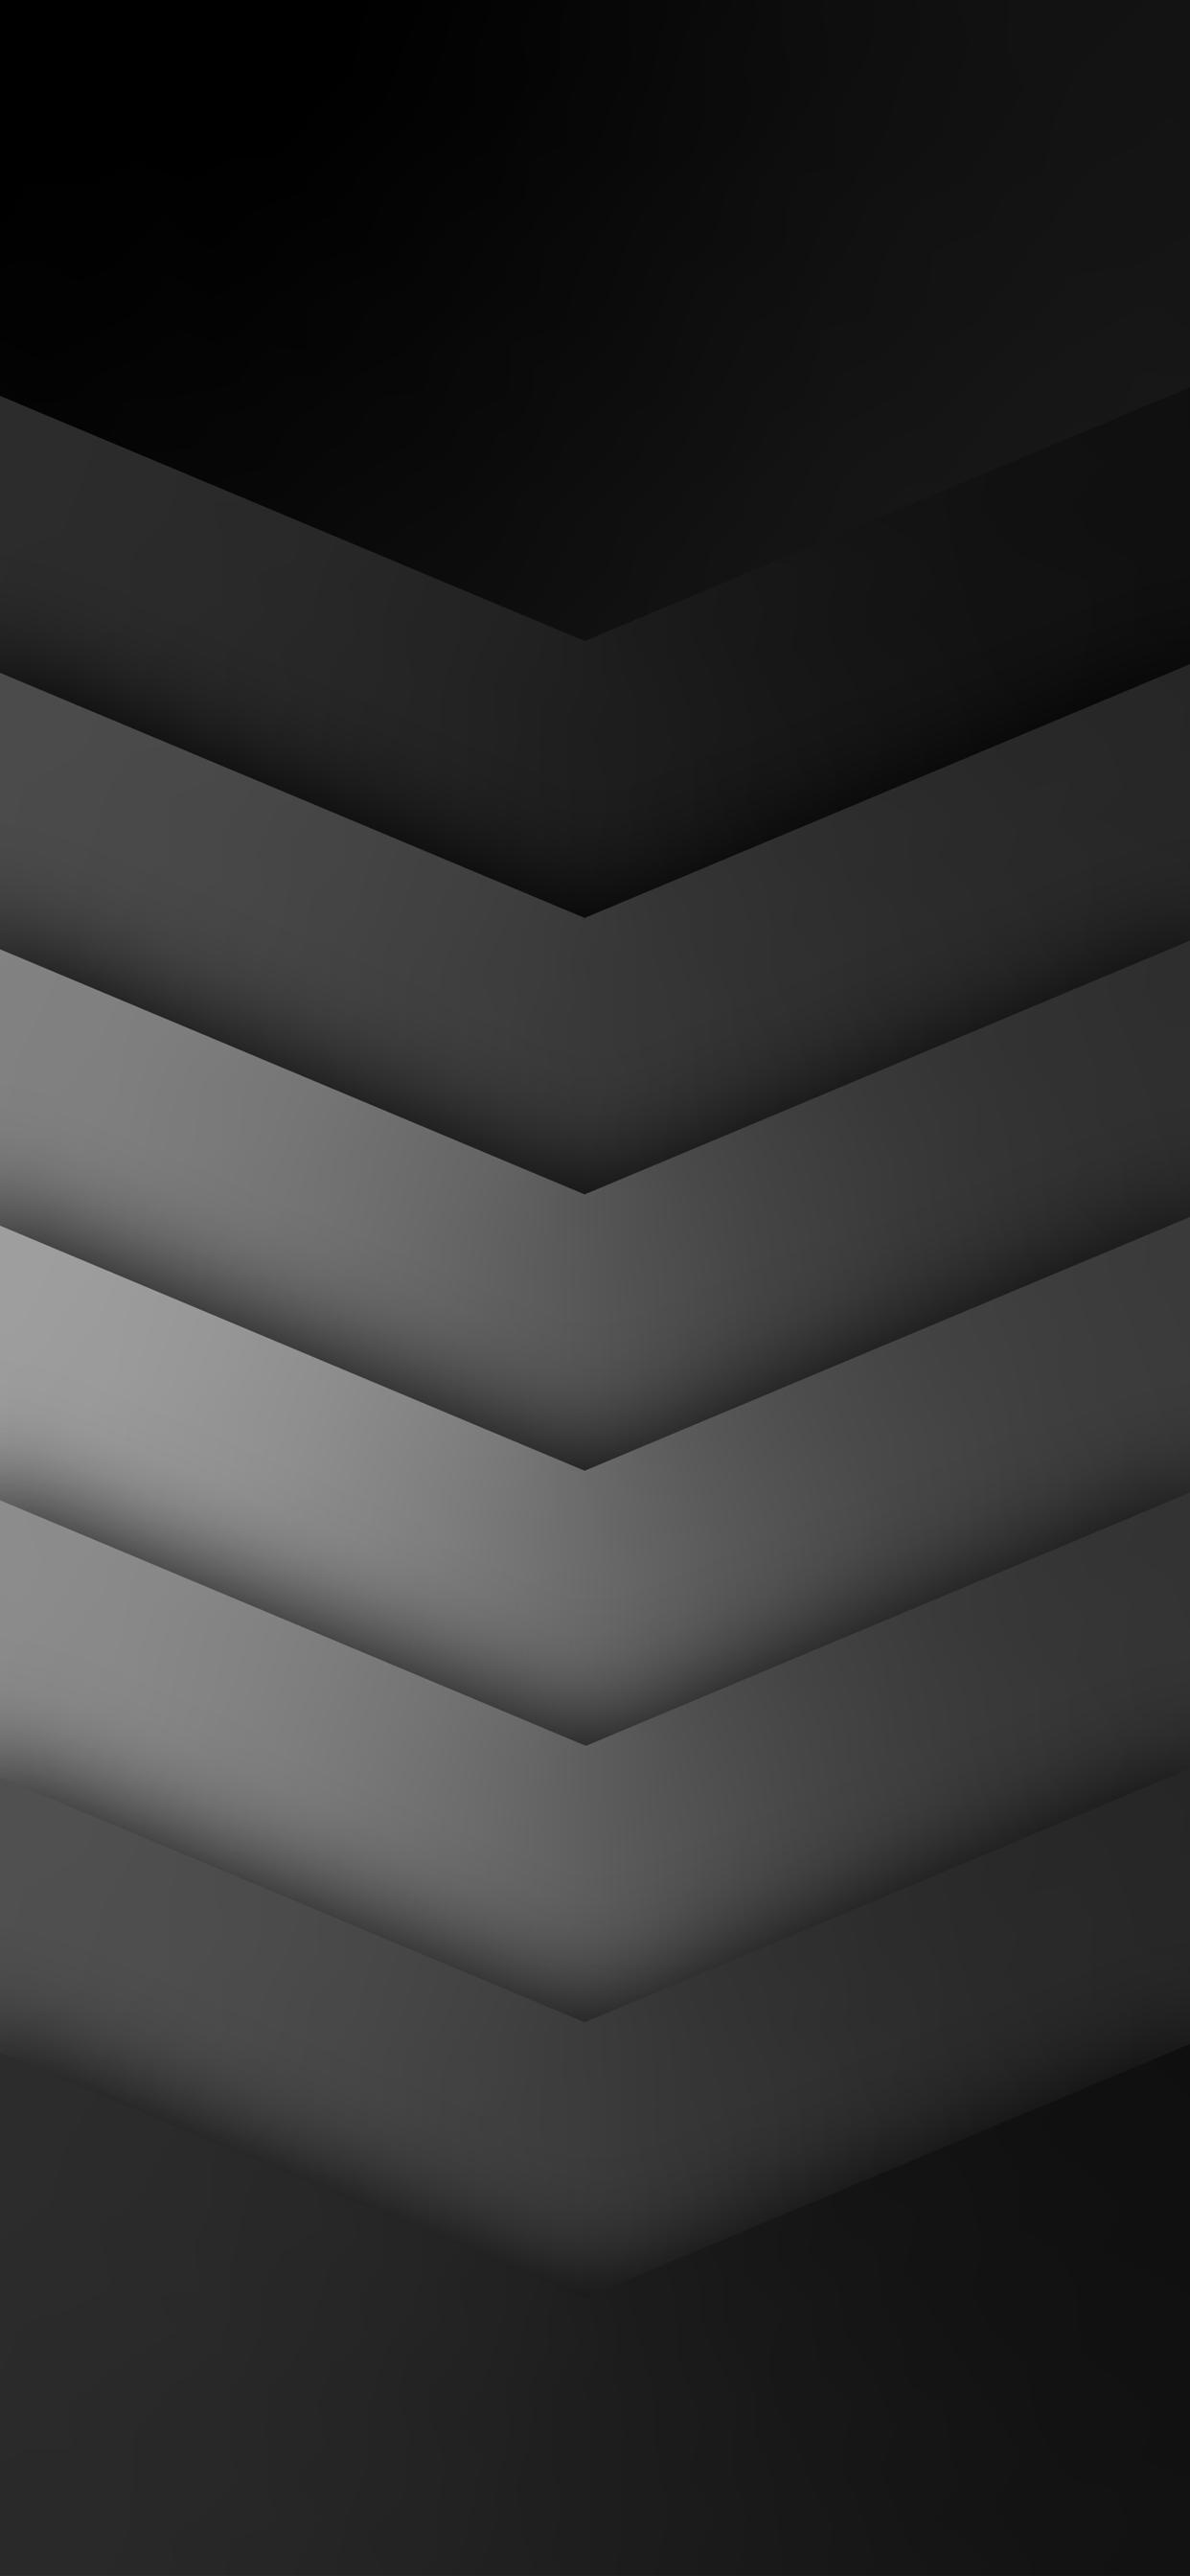 Iphoneブラック 暗い壁紙 1242x26 Wallpapertip